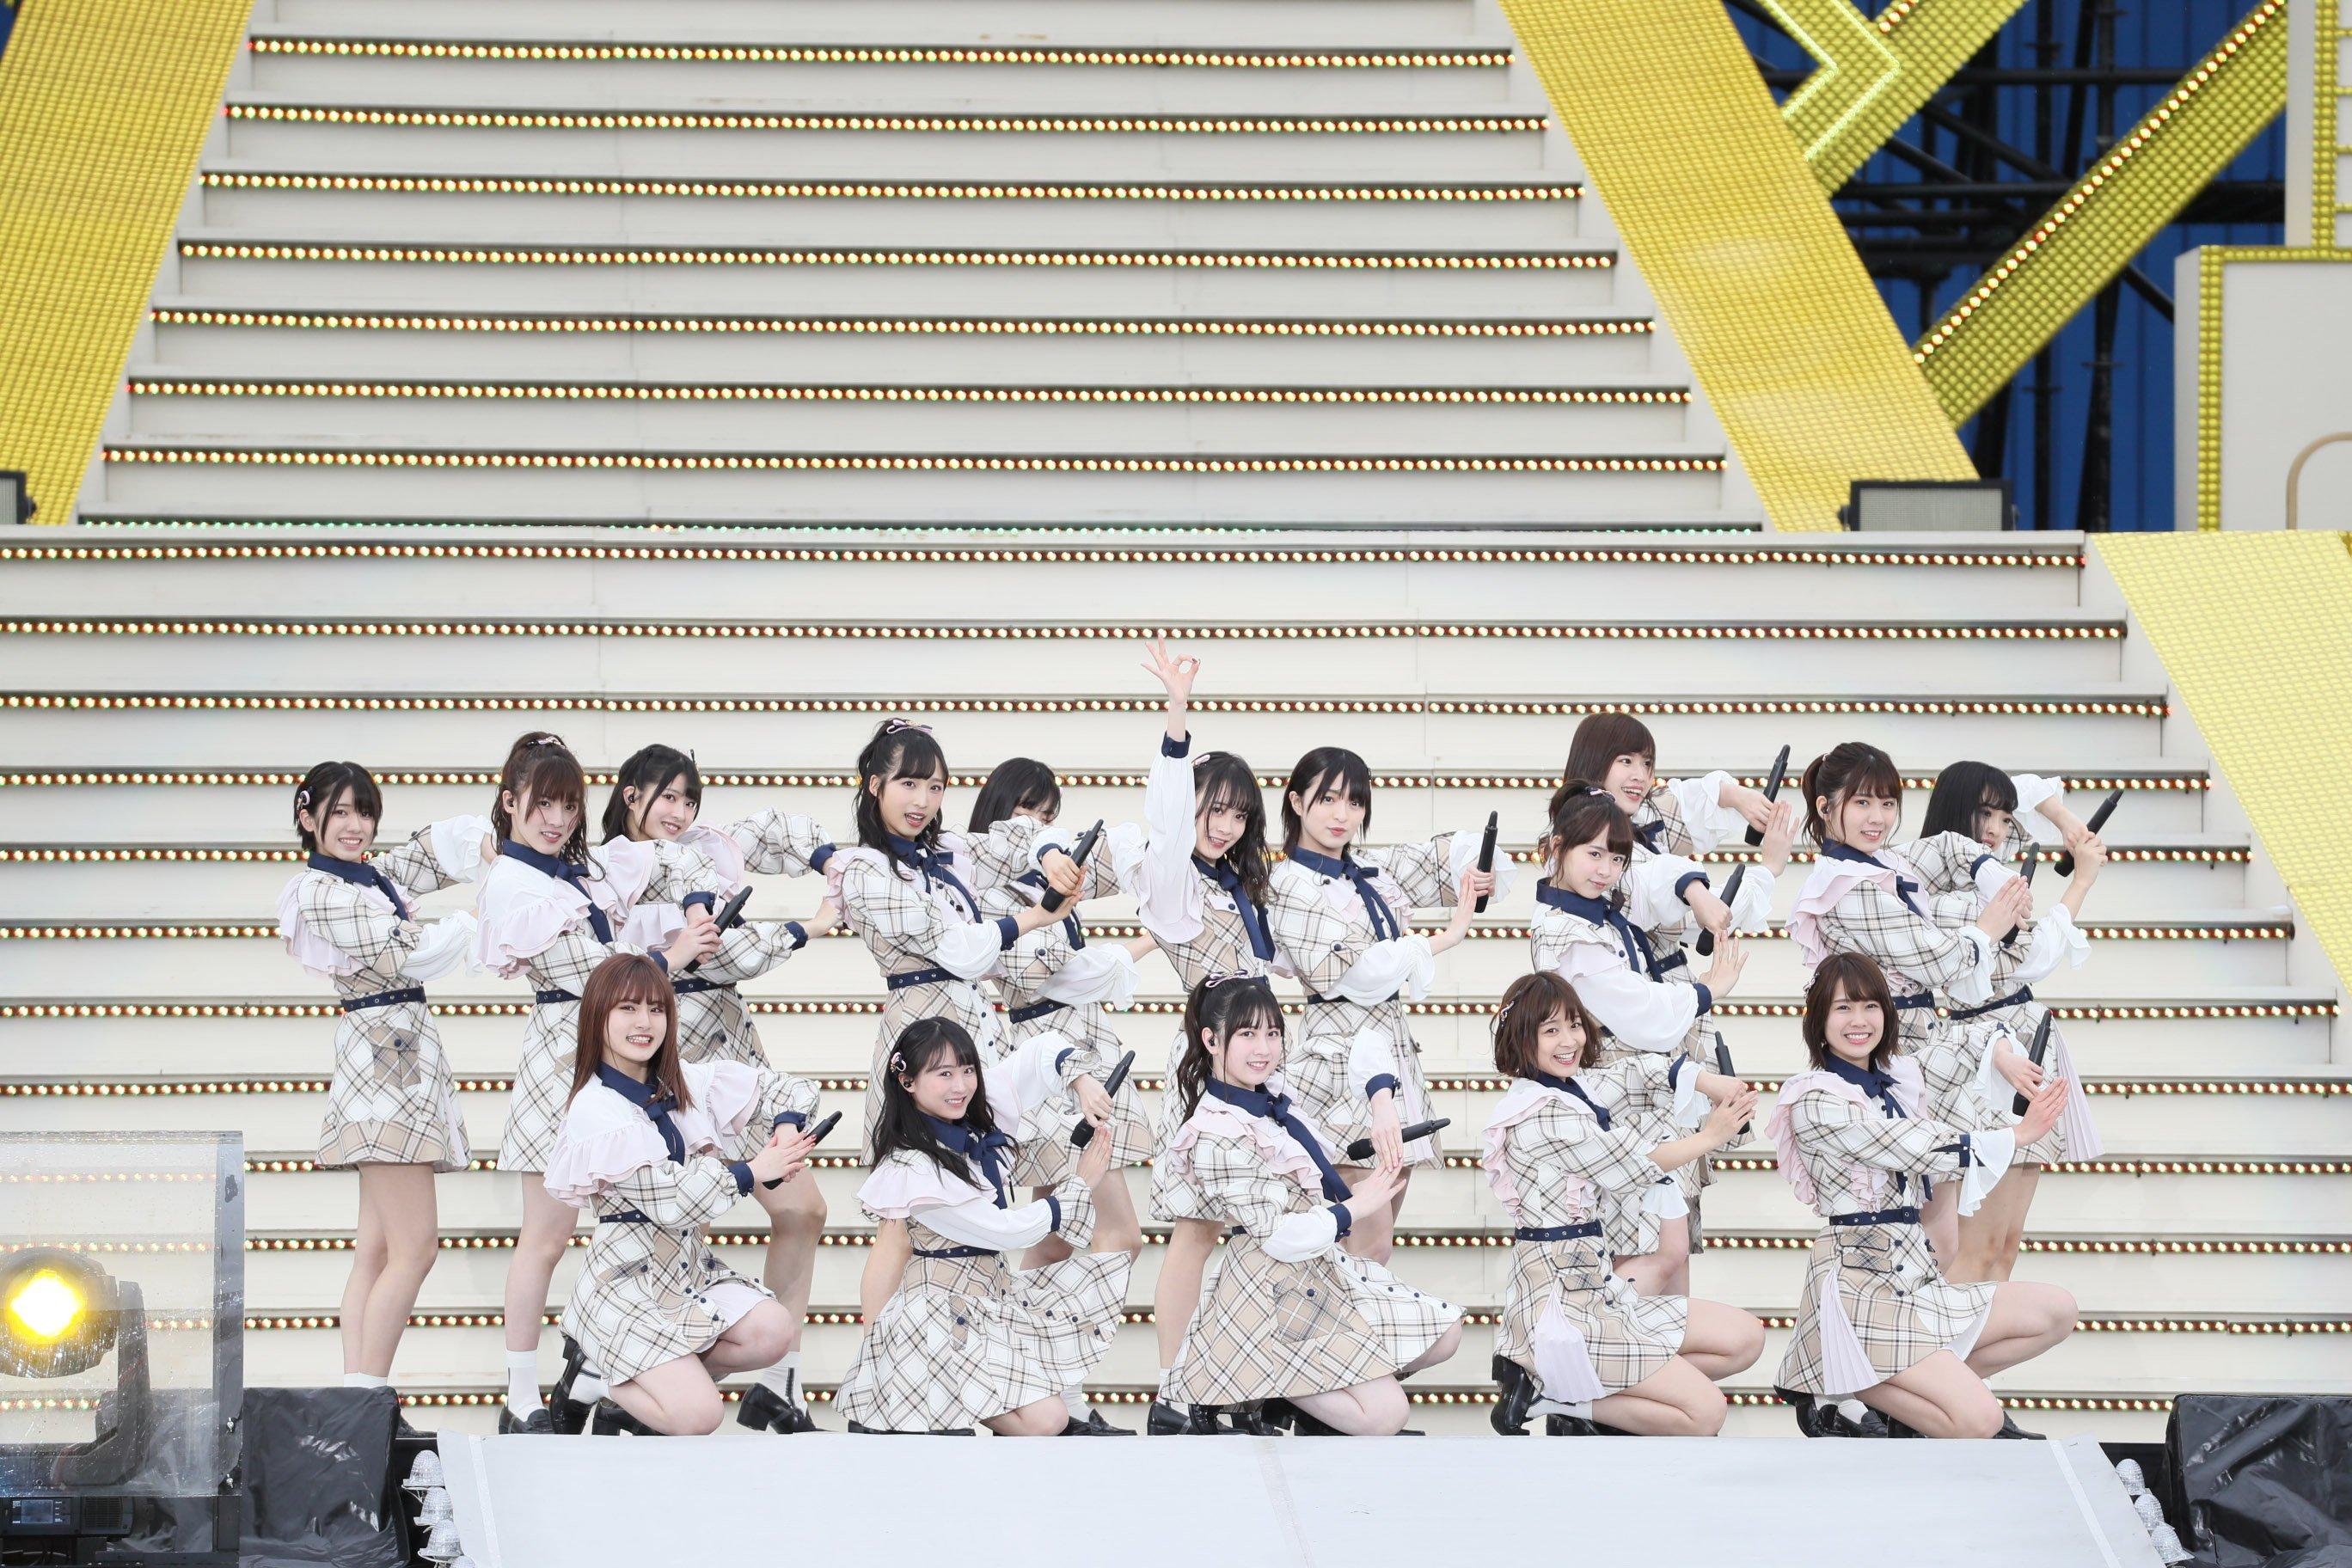 AKB48小嶋真子「笑顔で卒業」AKB48フェスのトリを飾る【写真19枚】の画像010